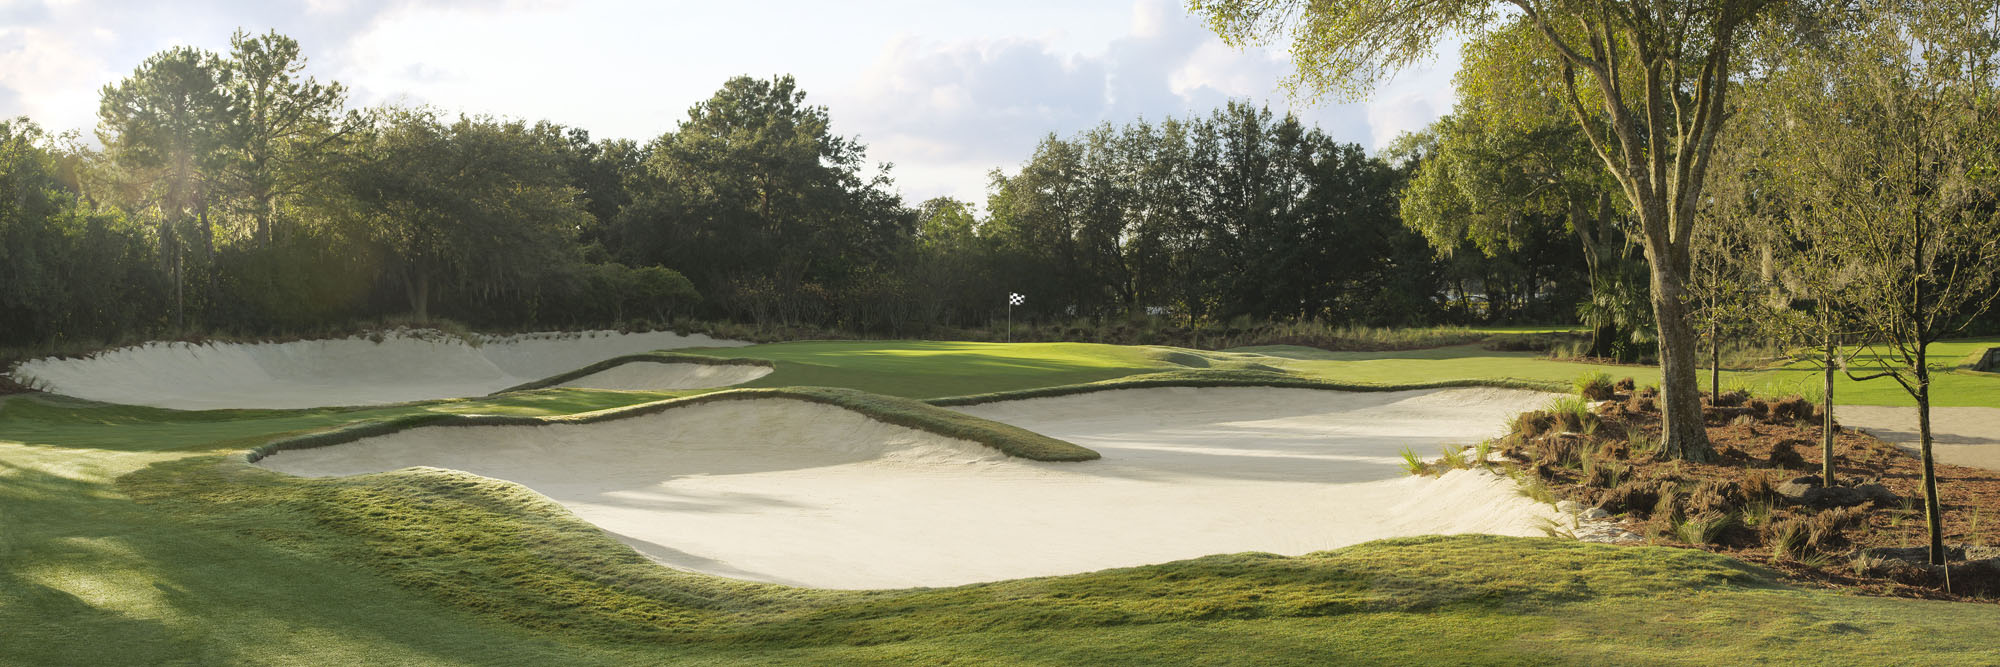 Golf Course Image - Old Memorial Golf Club No. 6